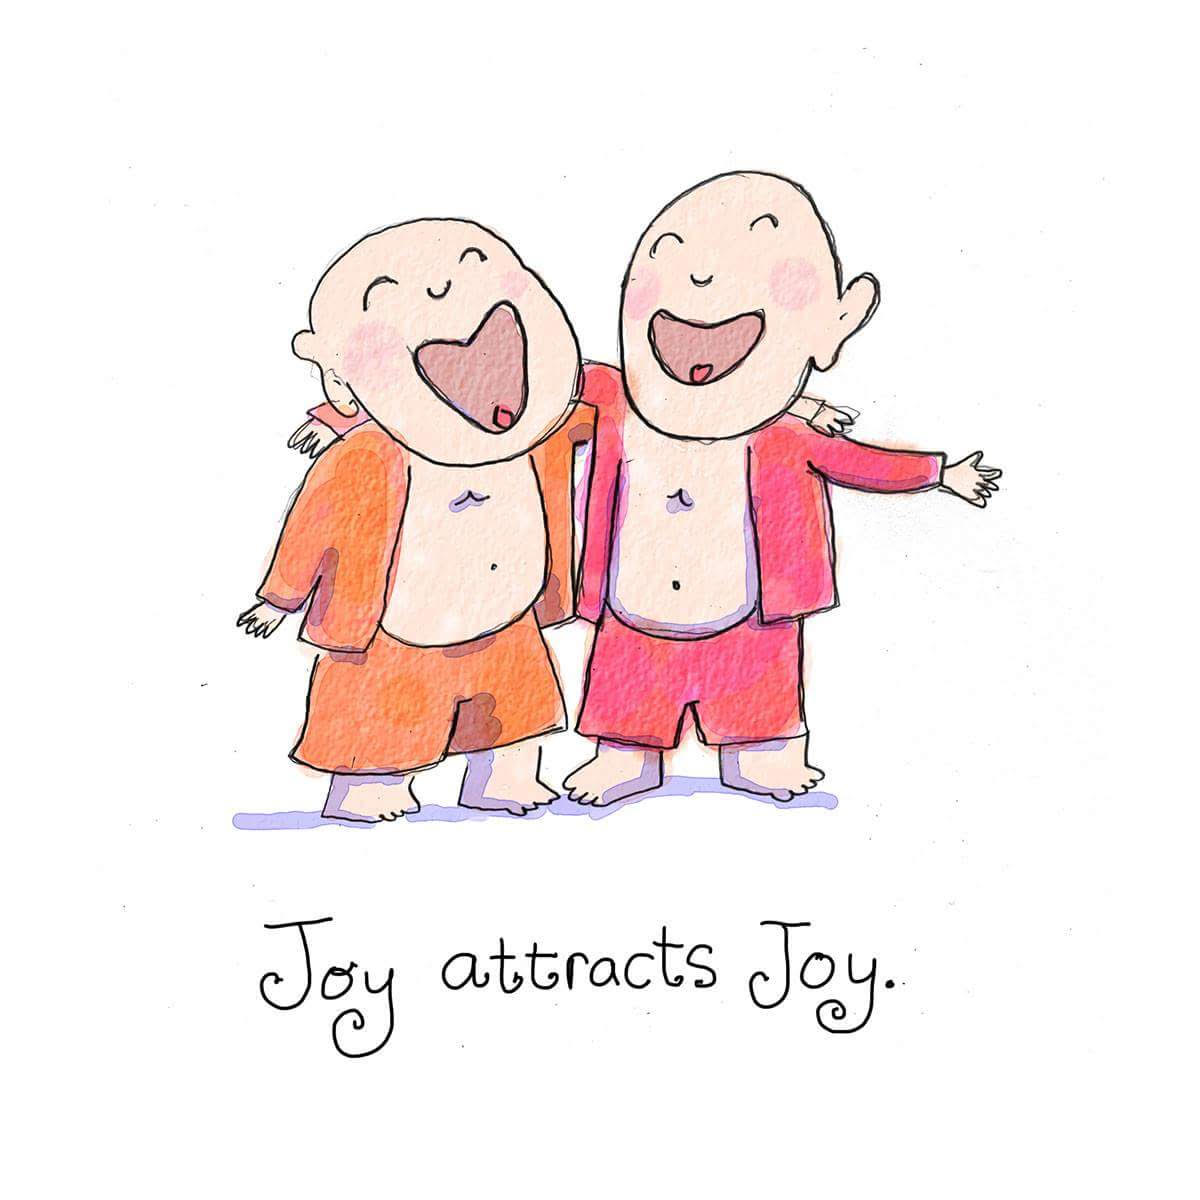 joy buddha inversions.jpg